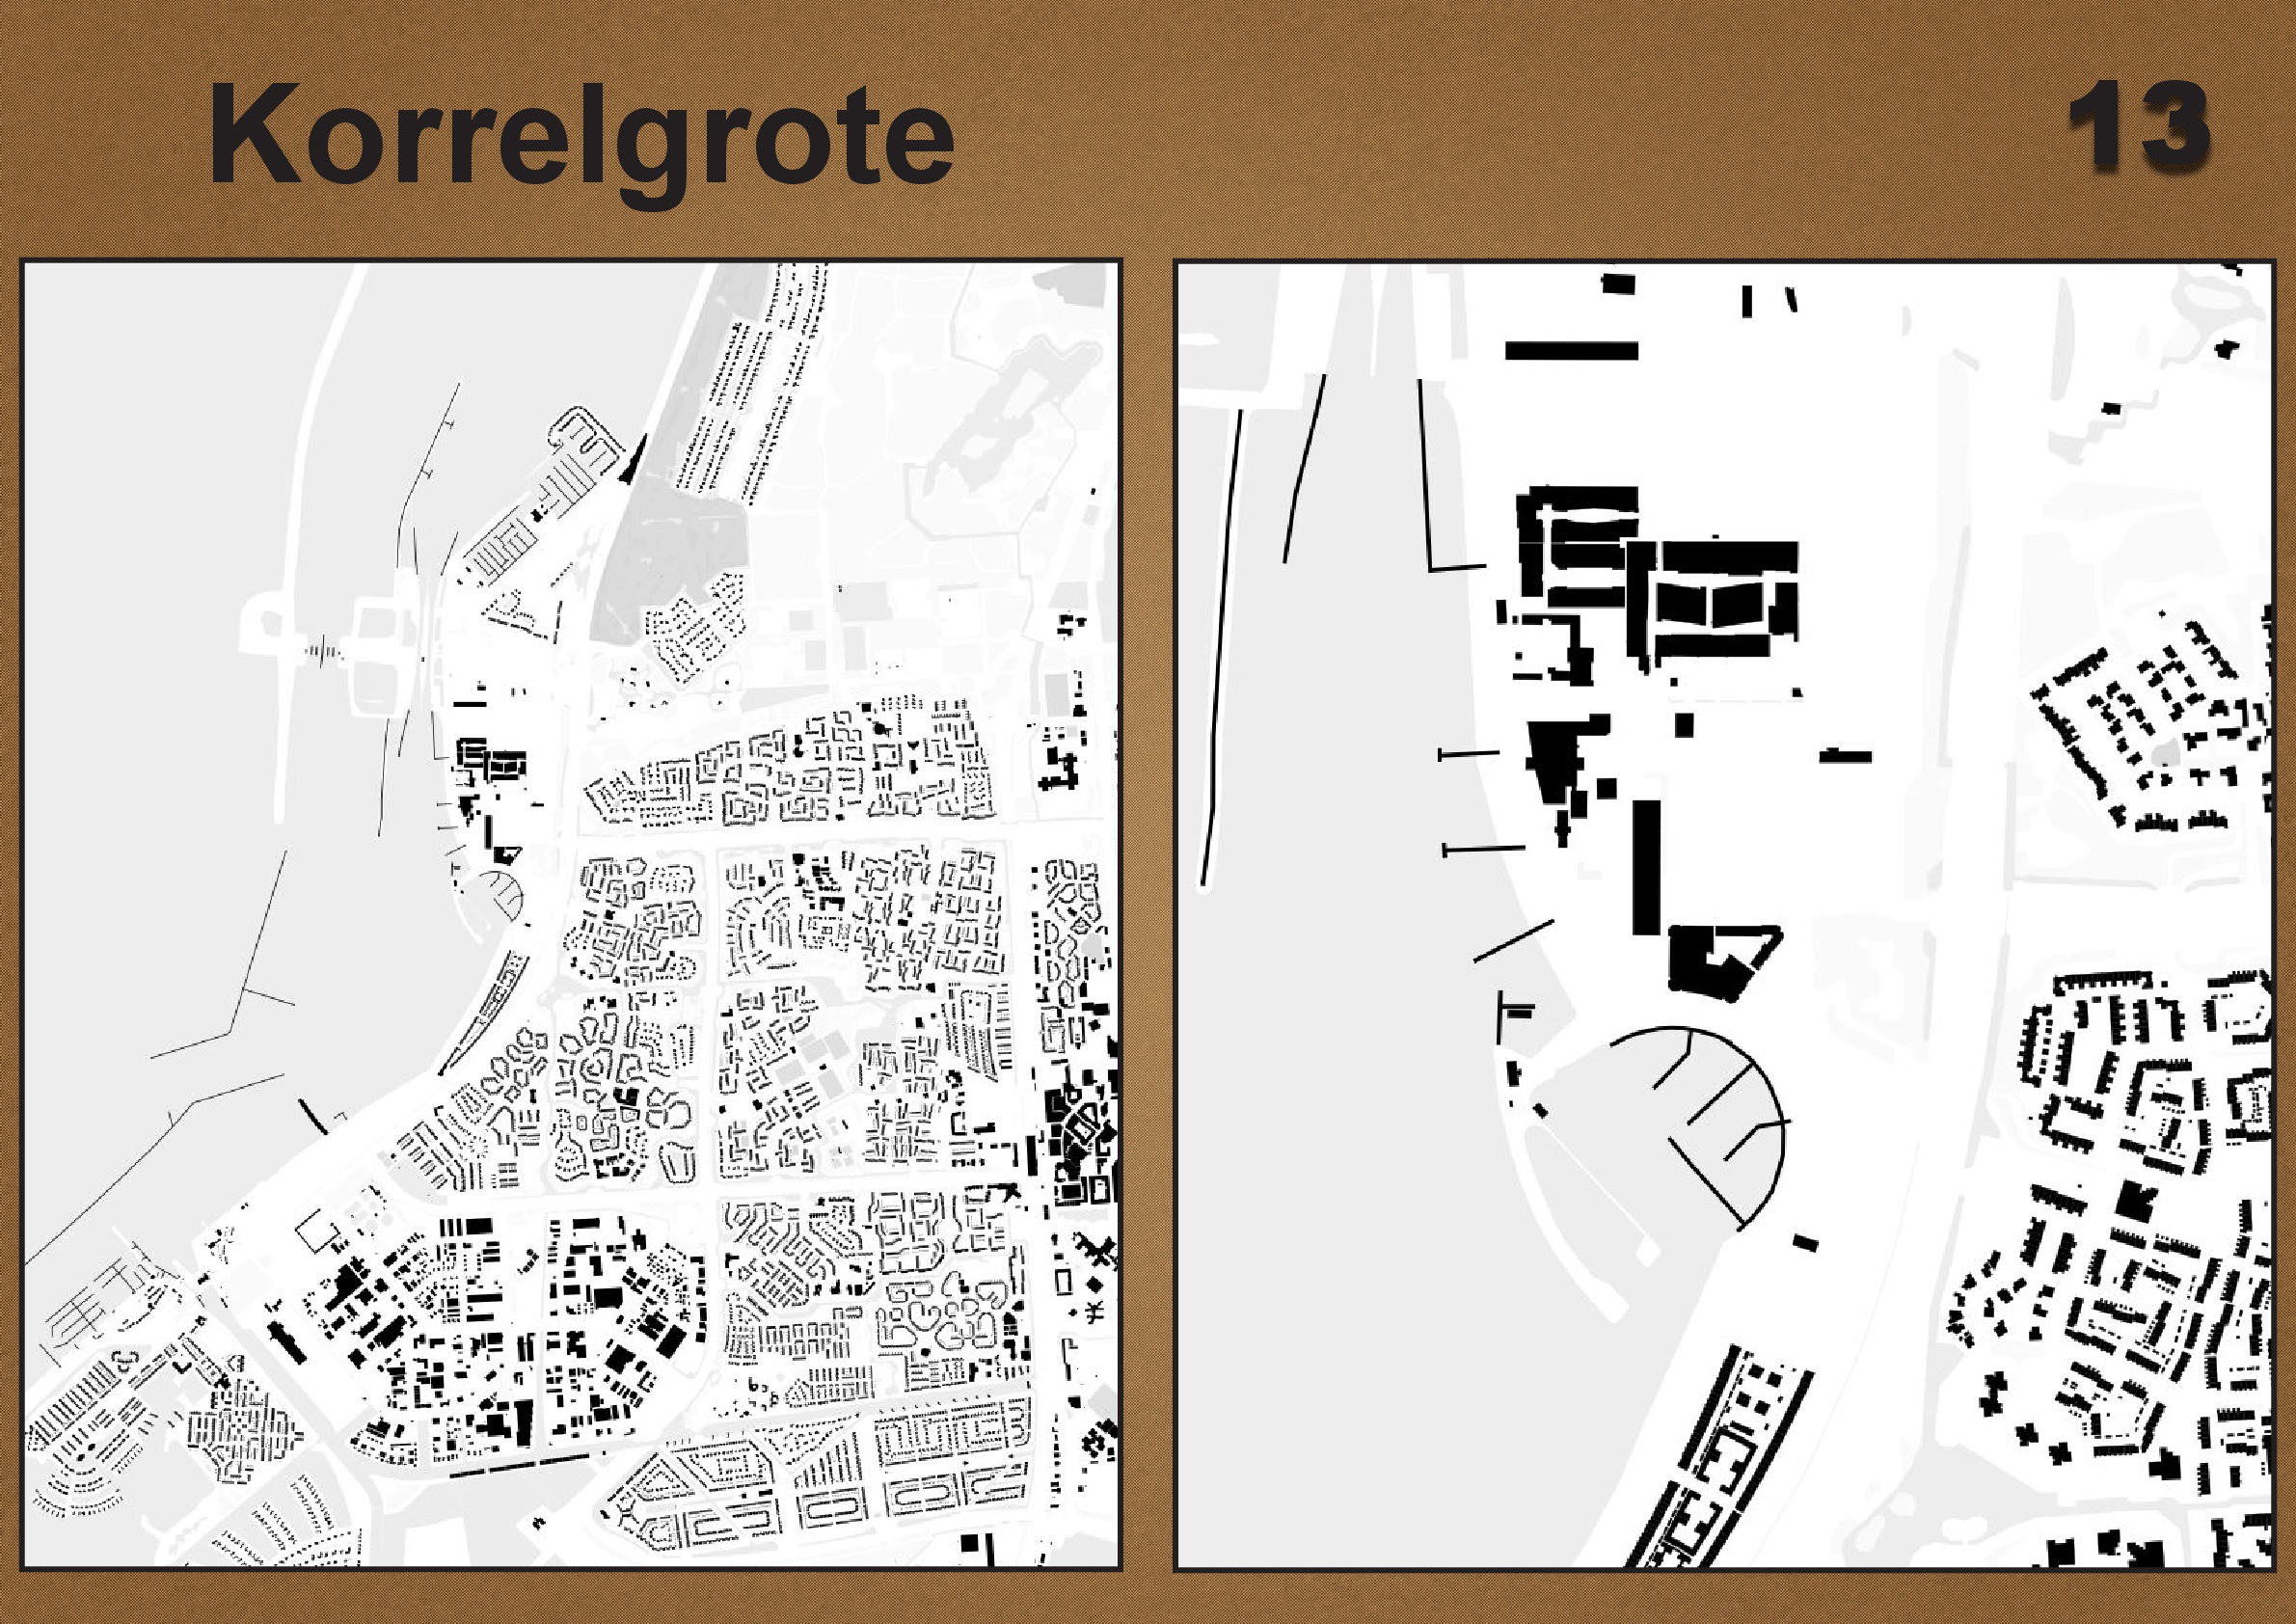 Boekwerk-Duurzaam-Detailleren-1-GM-MJ-28-08-2016-013